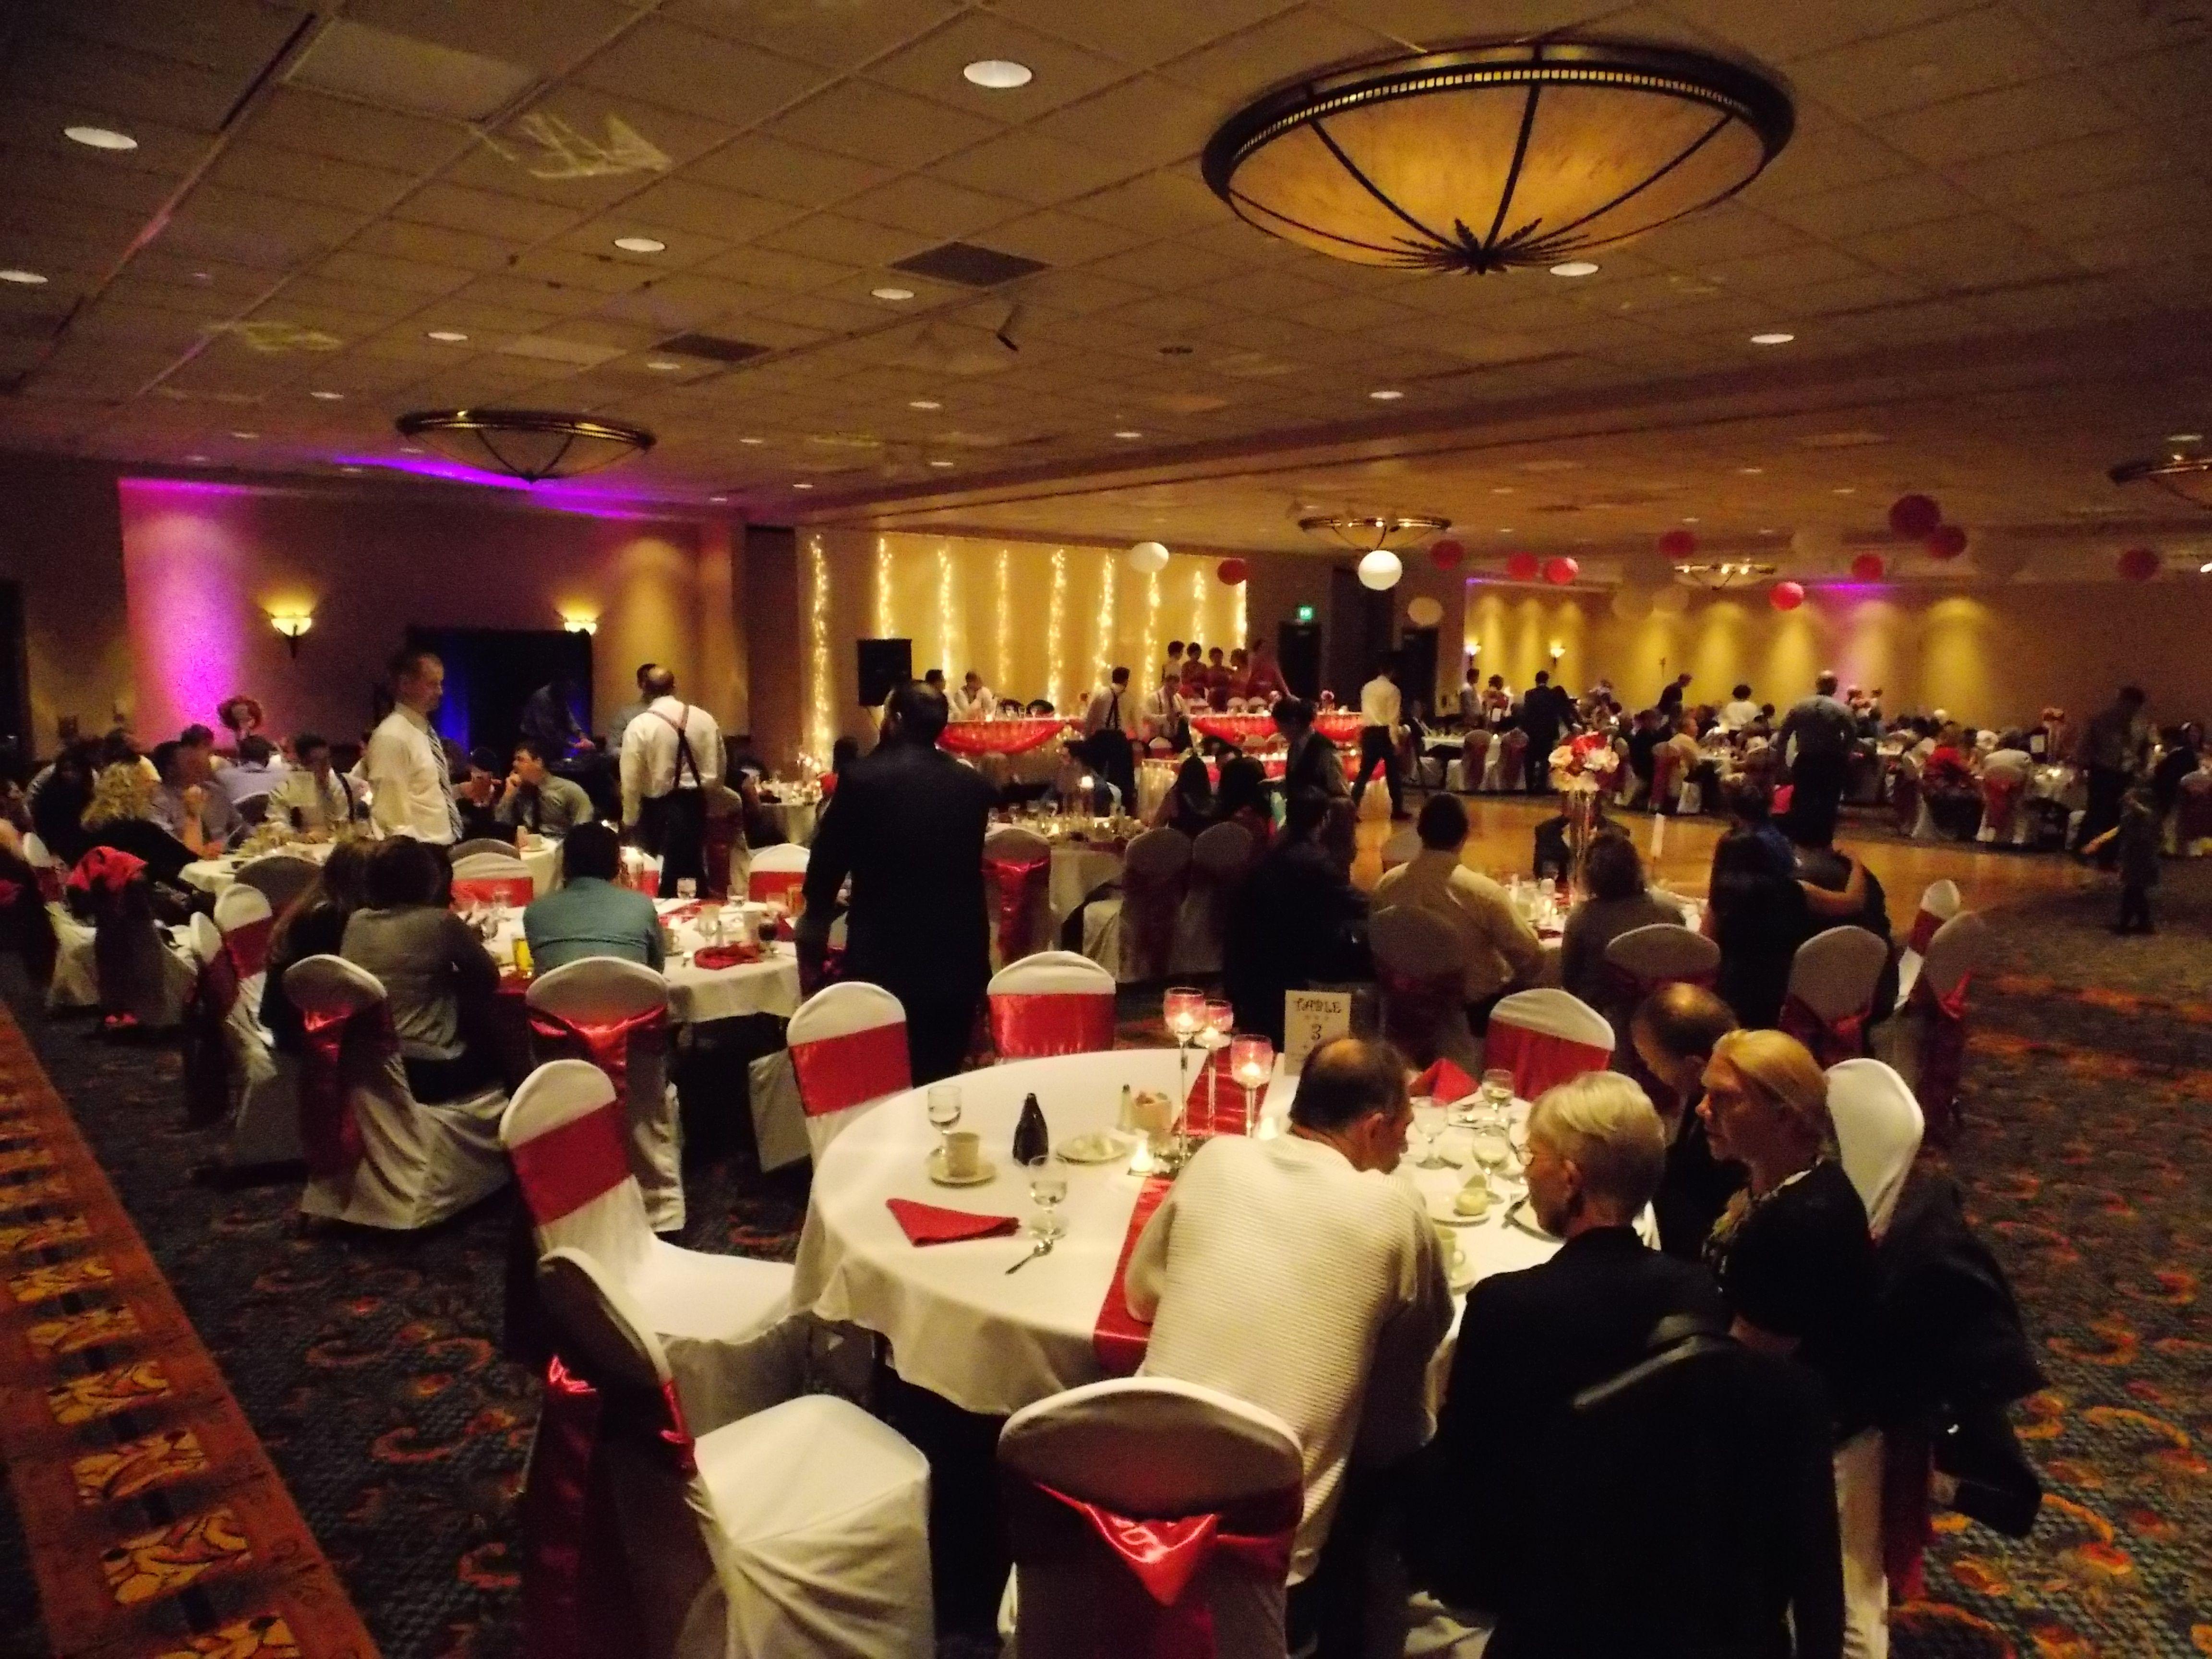 A View Of The Radisson Quad City Plaza Ballroom Davenport Iowa Photo By Marske Music Productions Kirk Marske Dj Emcee Quad Cities Company Party Emcee